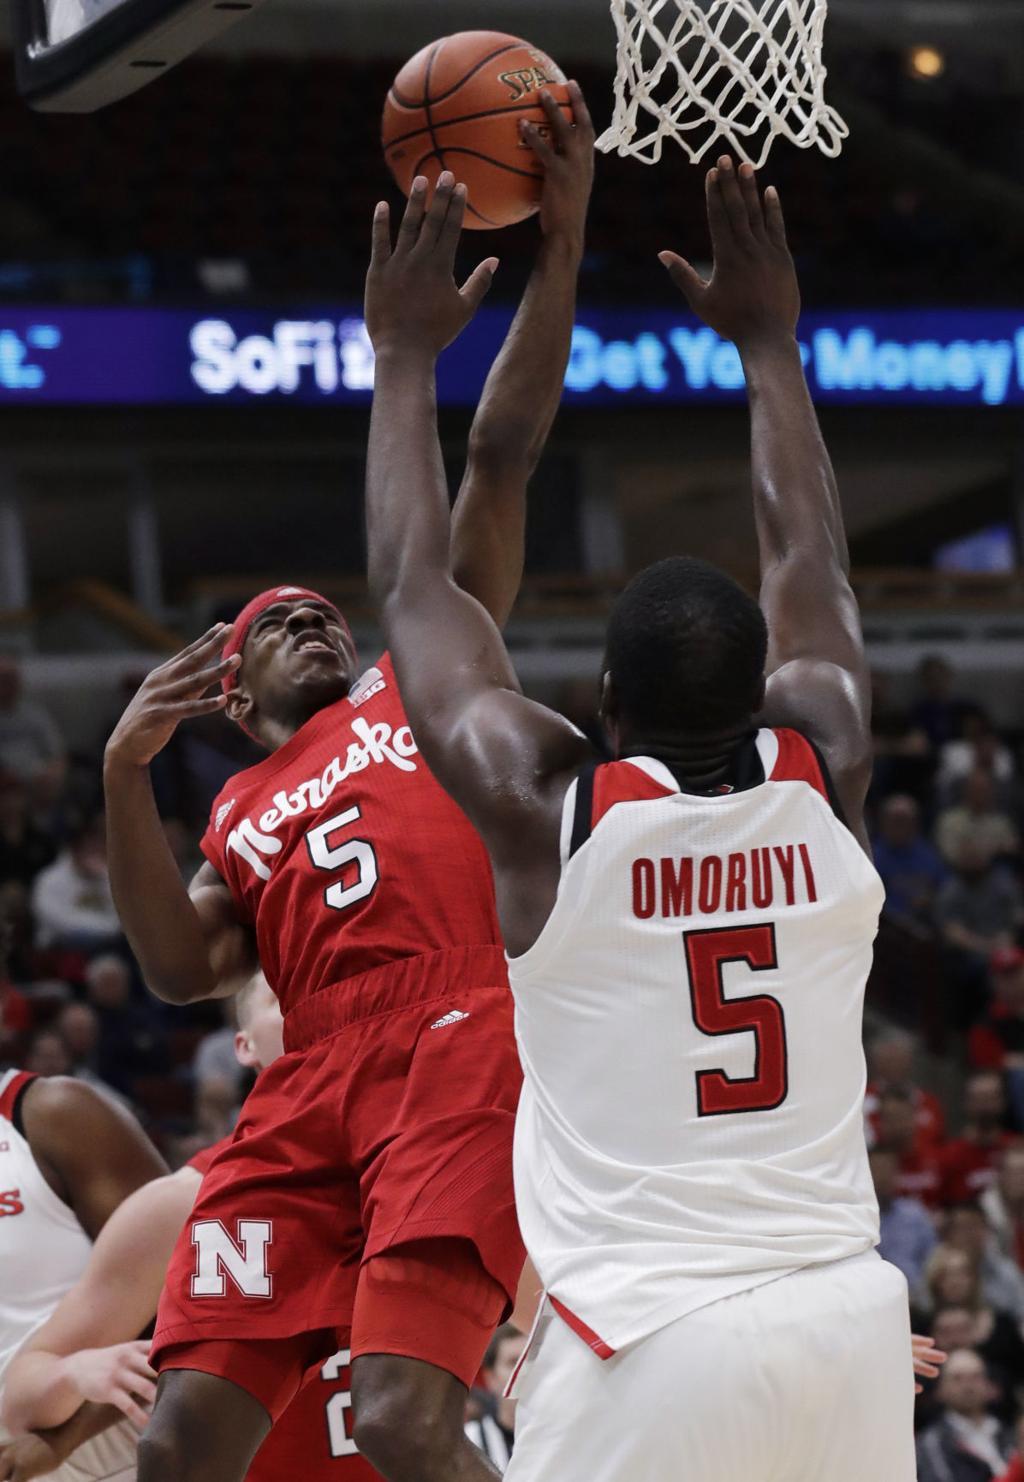 Photos: Big Ten men's basketball tournament tips off in